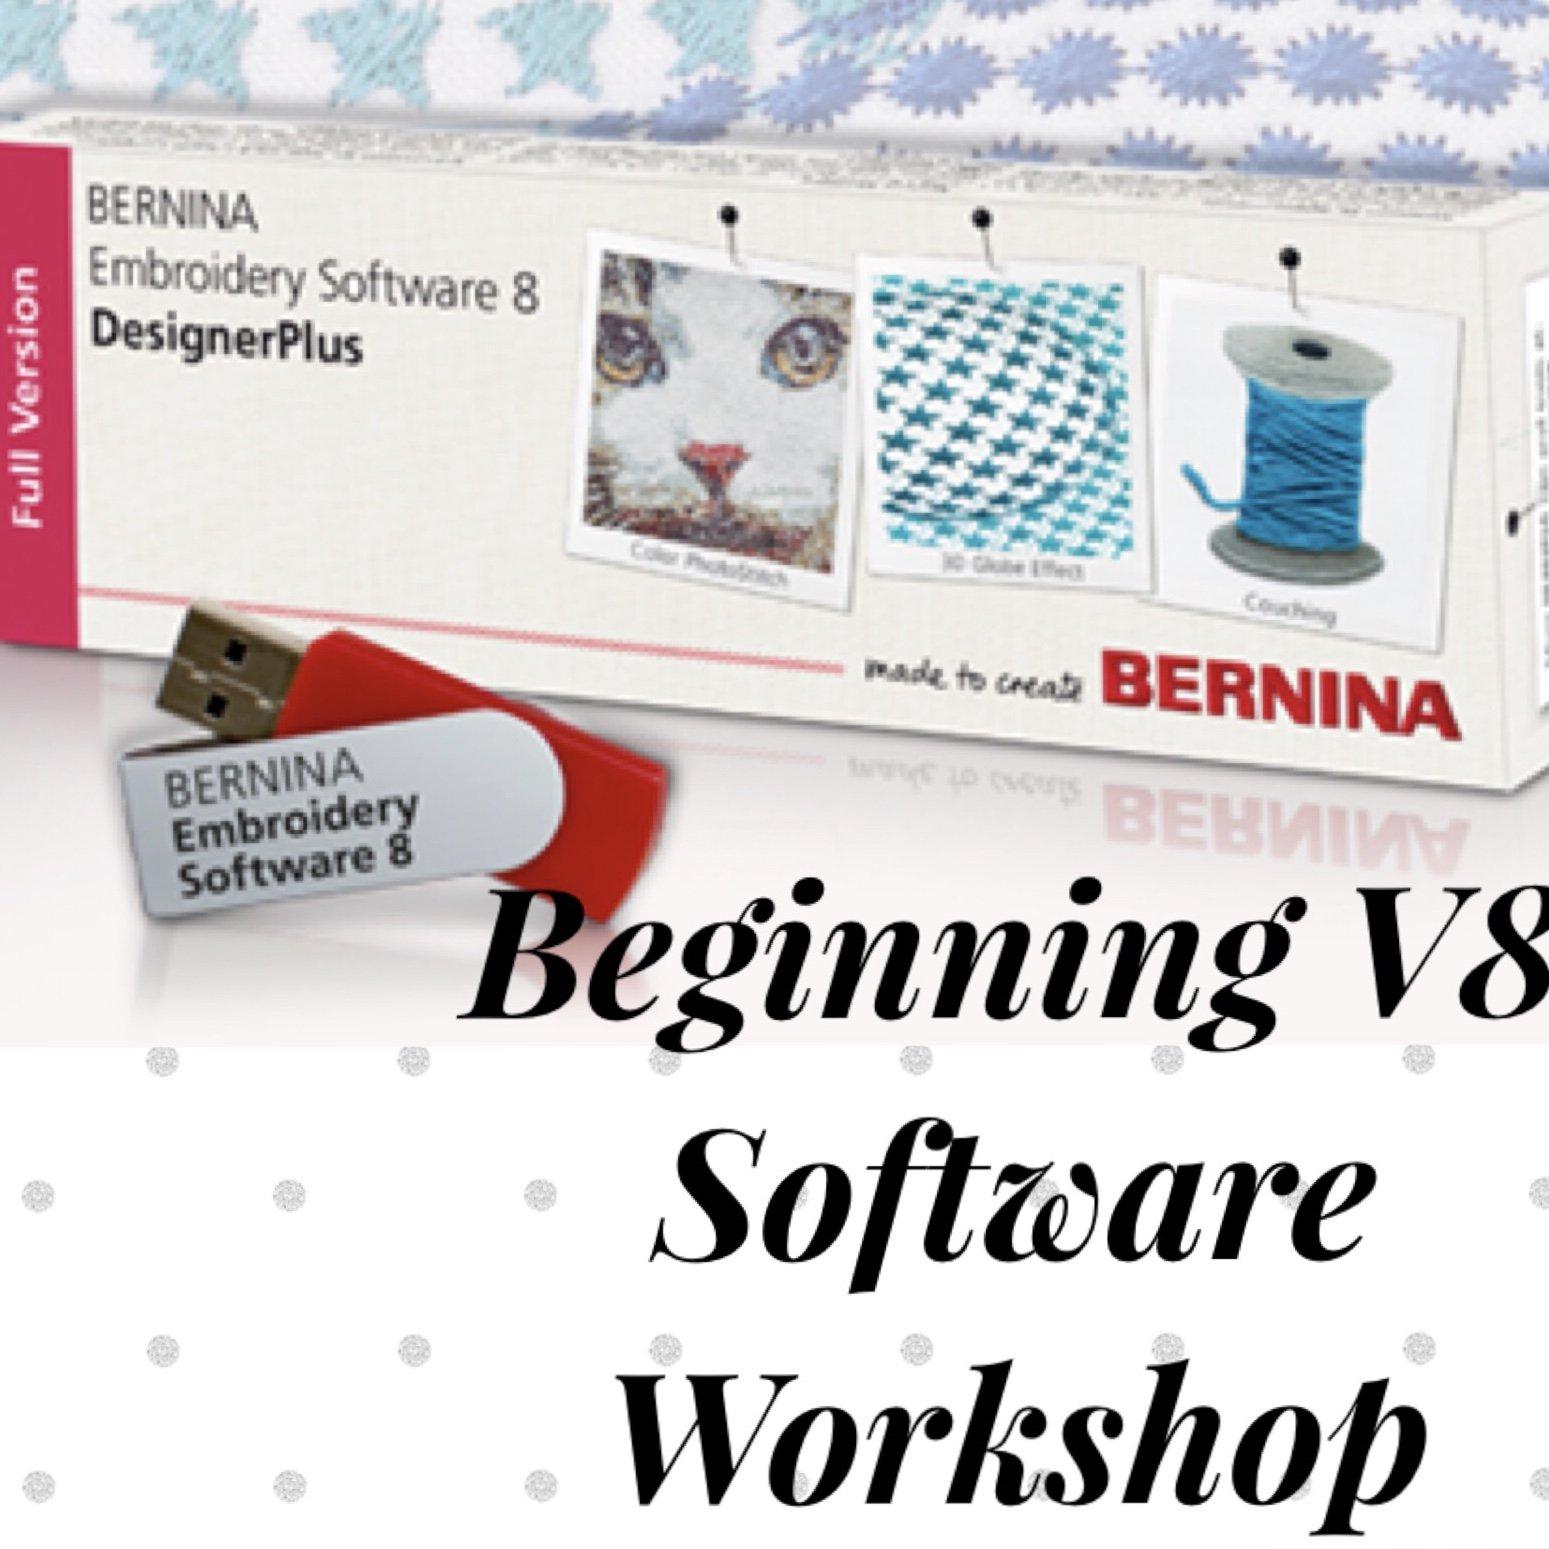 026 Software Basics Bernina V8 Workshop Beginners